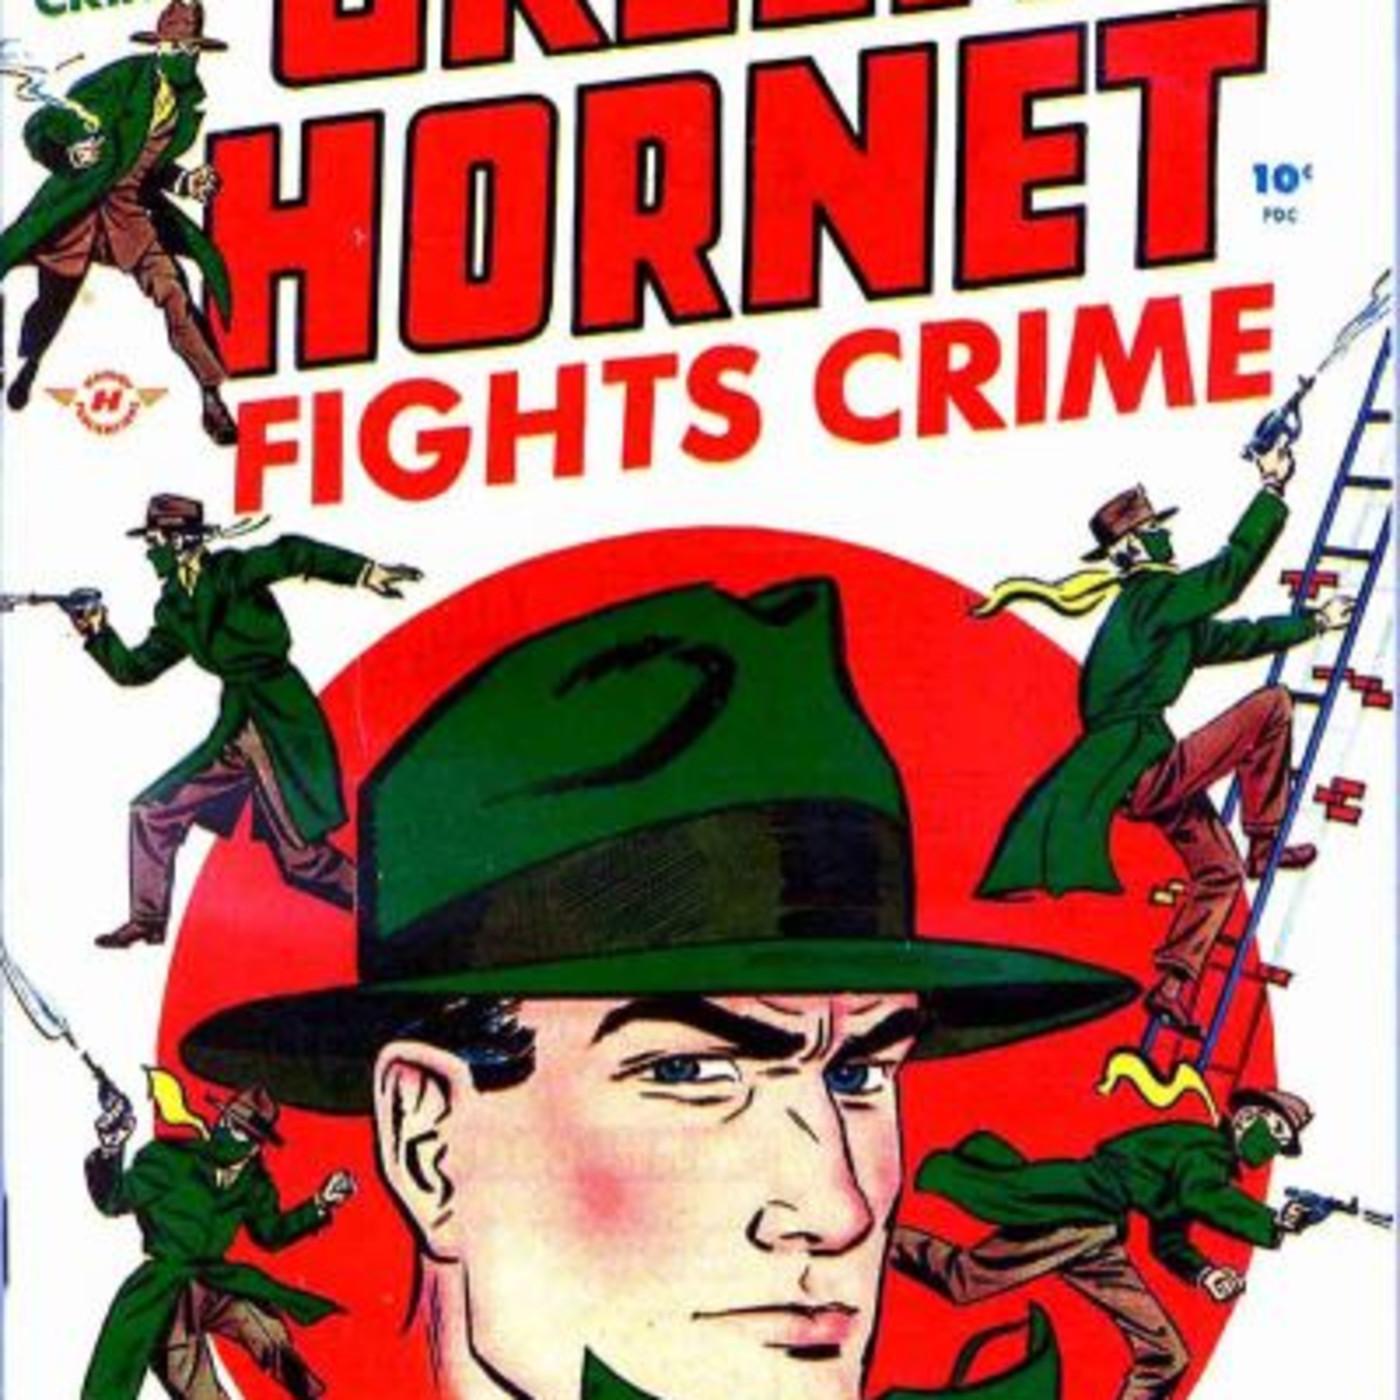 The Green Hornet - 00 - 451025WhatPriceGlamour